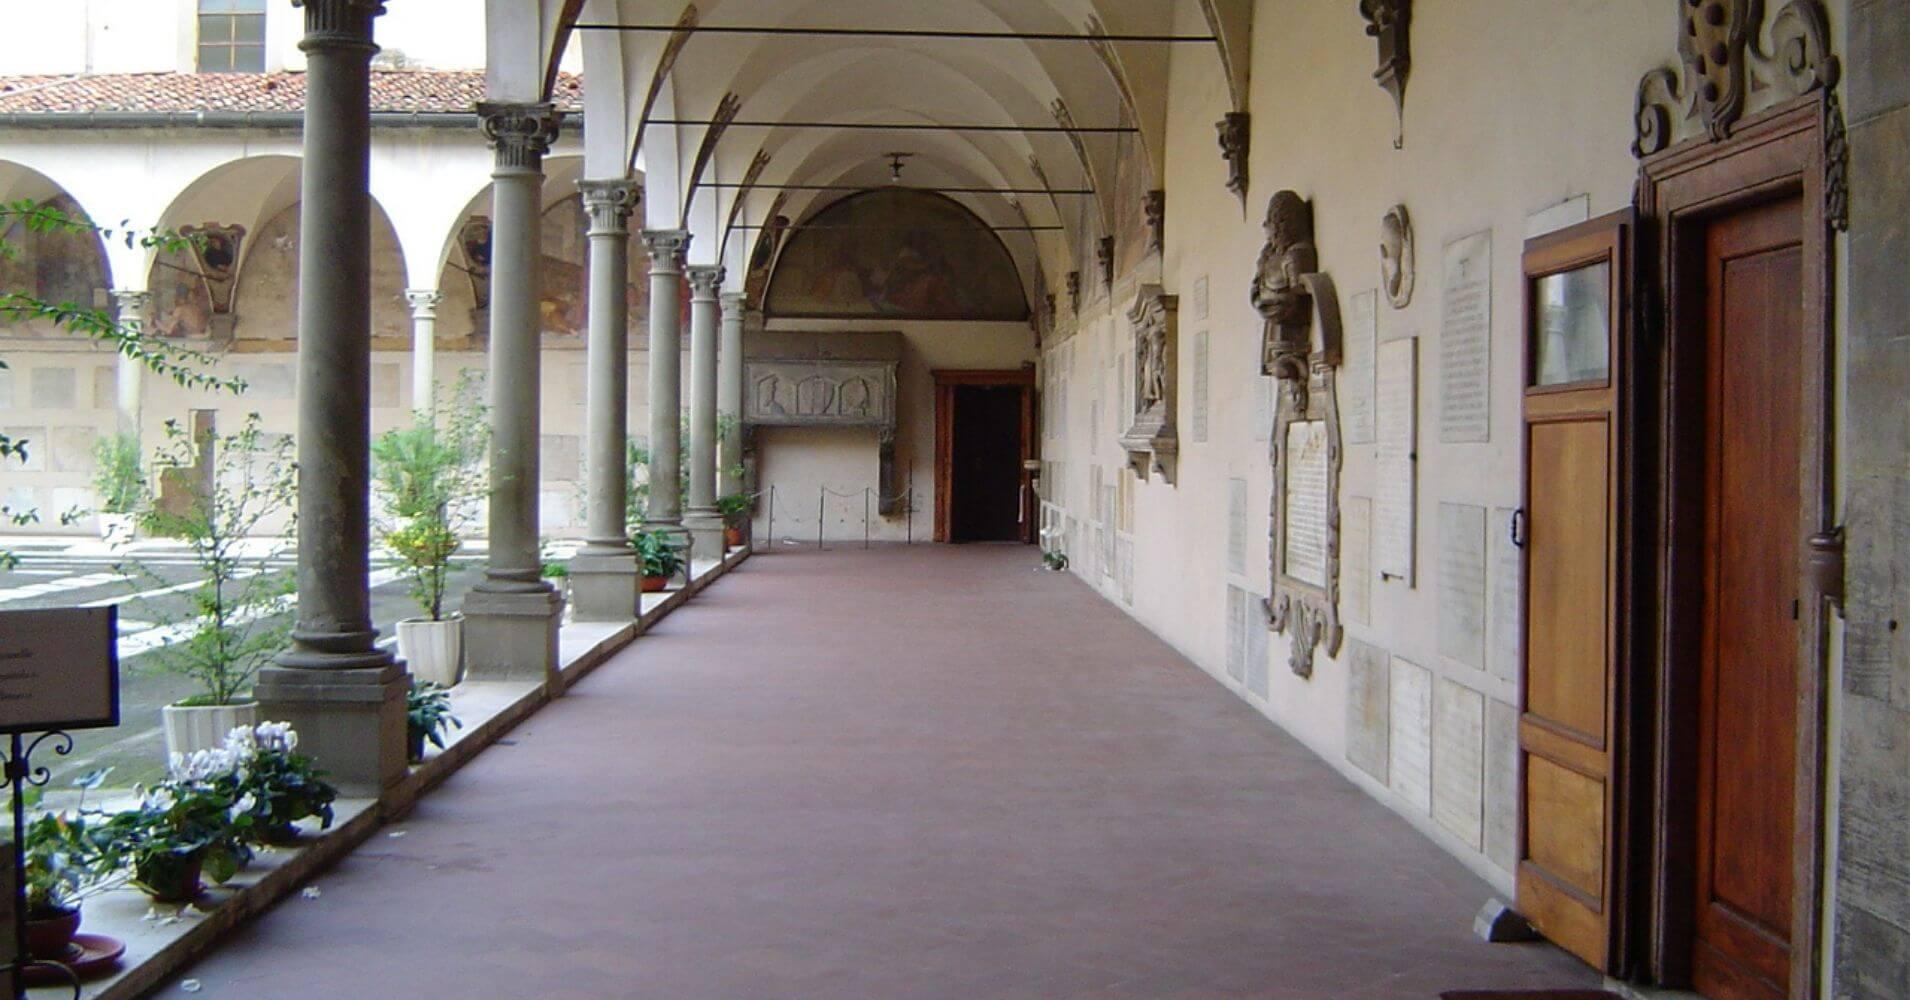 Museo Basílica Anunciación. Cinco días en Florencia. Toscana, Italia.